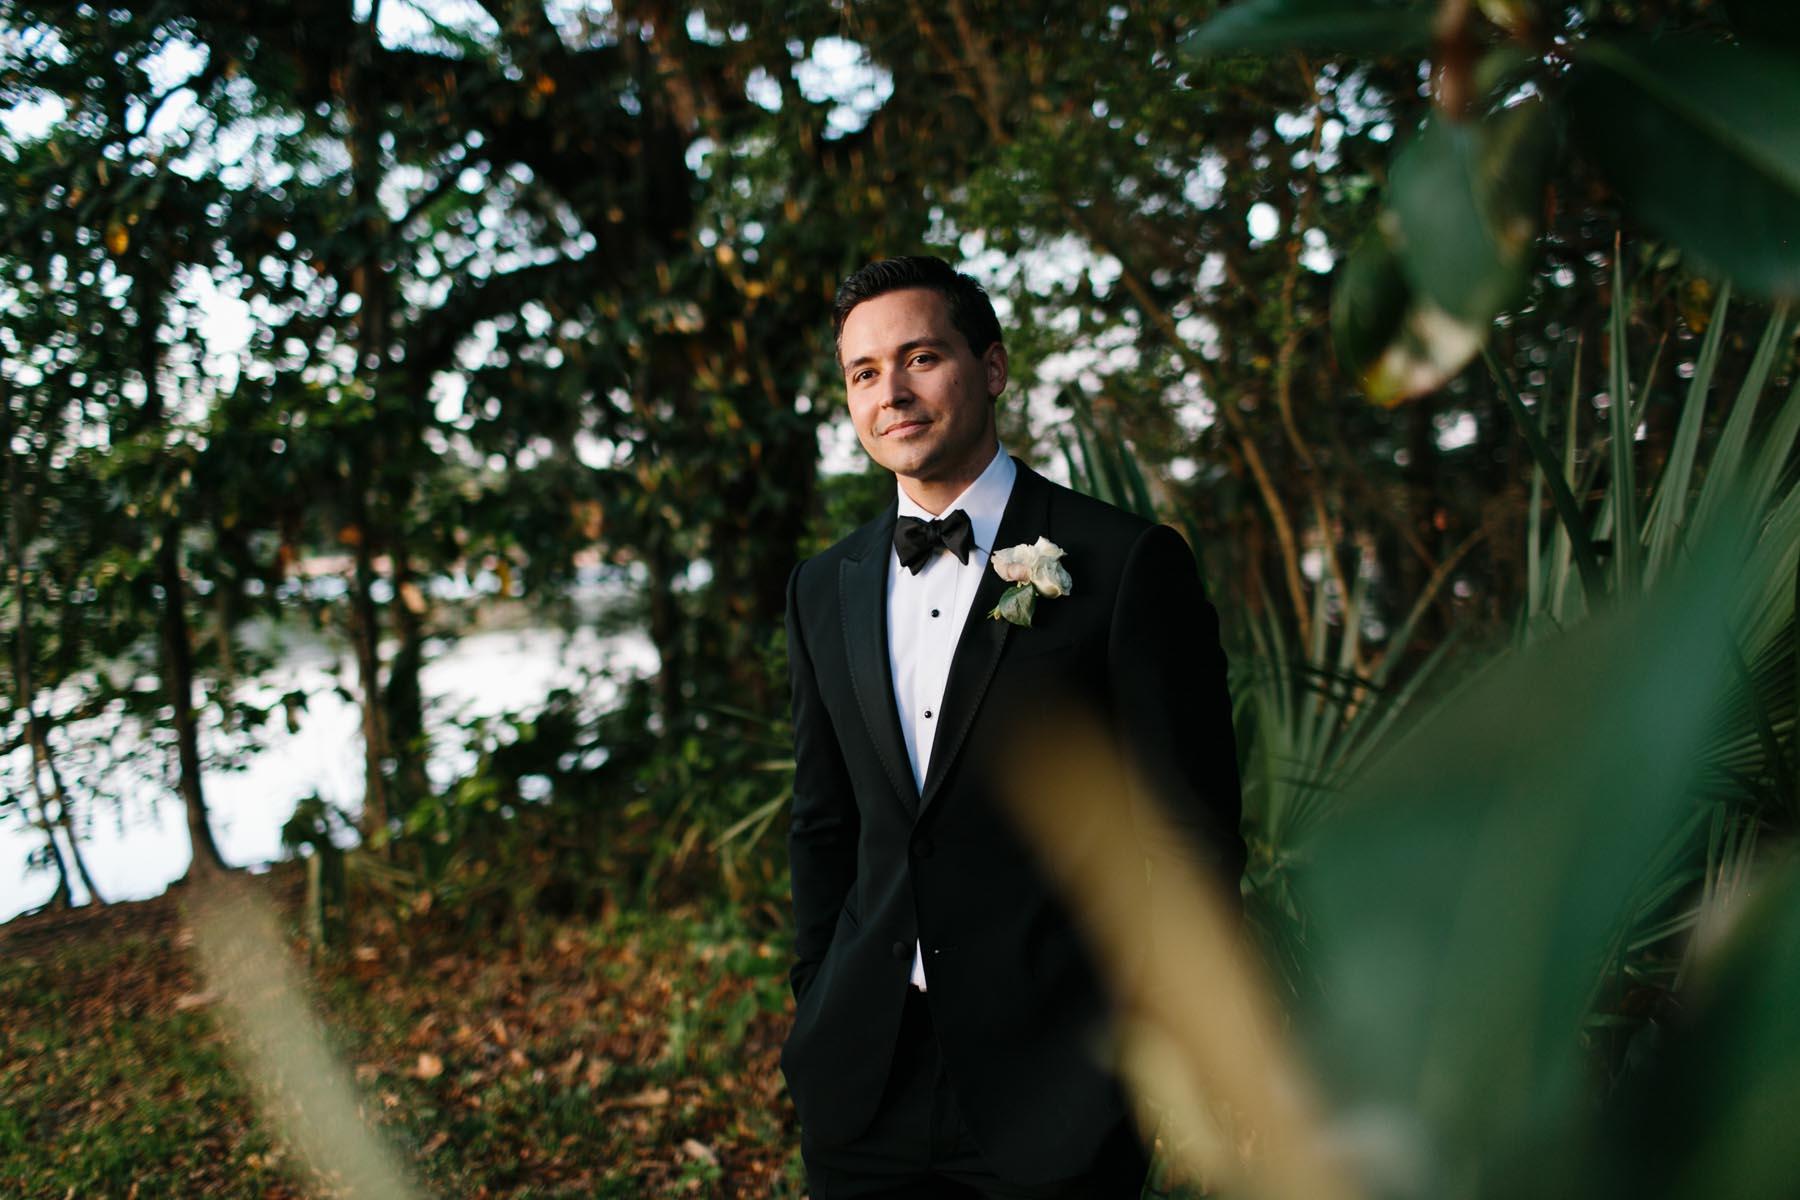 lowry wedding blog eden garden florida wedding-95